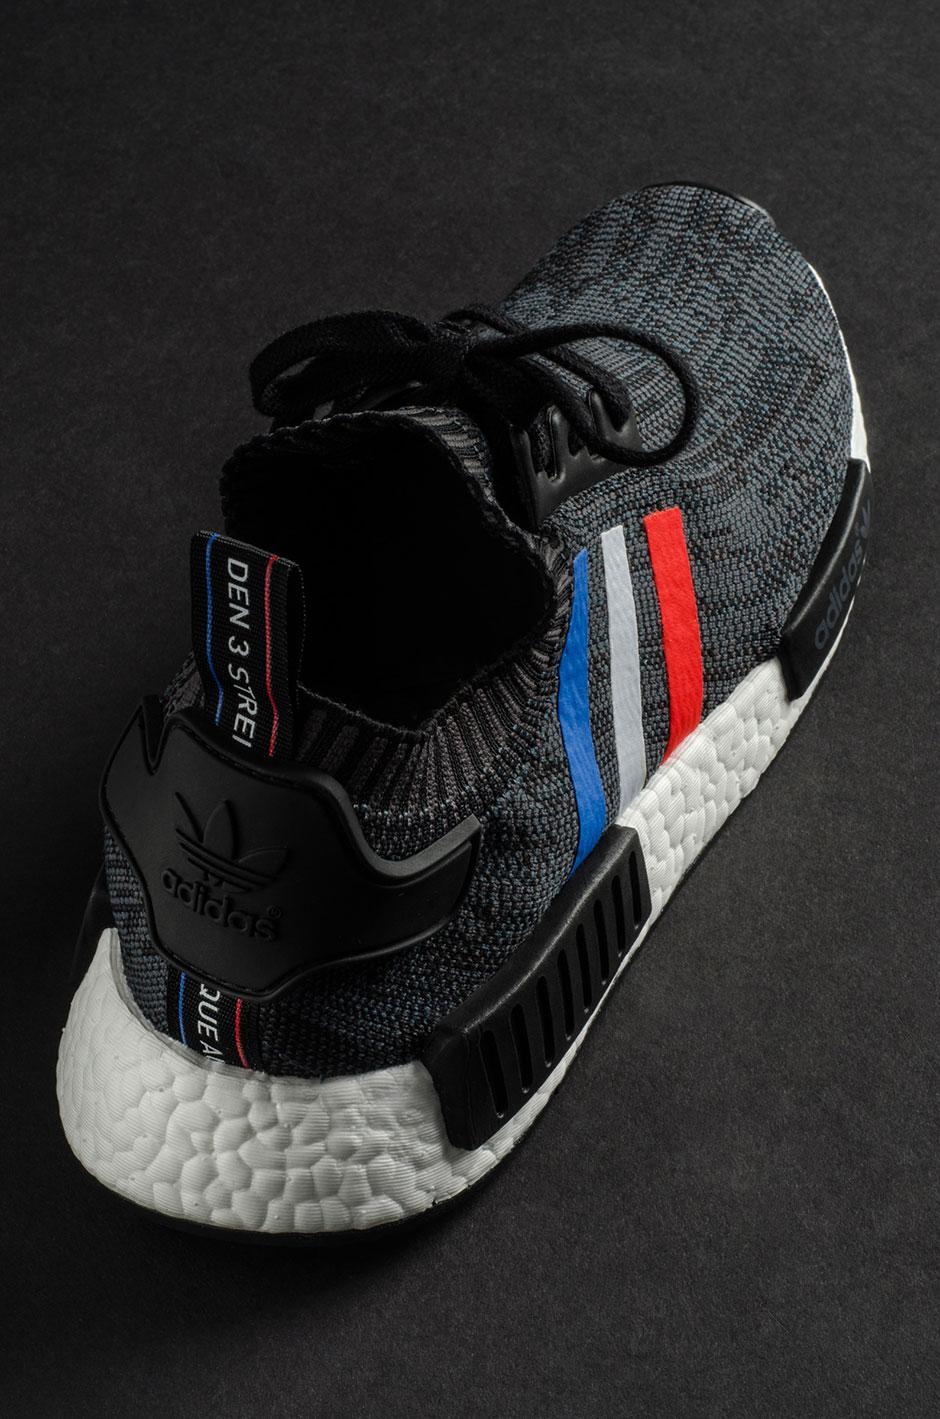 839f2d28b Finish Line Just Restocked adidas NMD R1 Colorways SneakerWatch